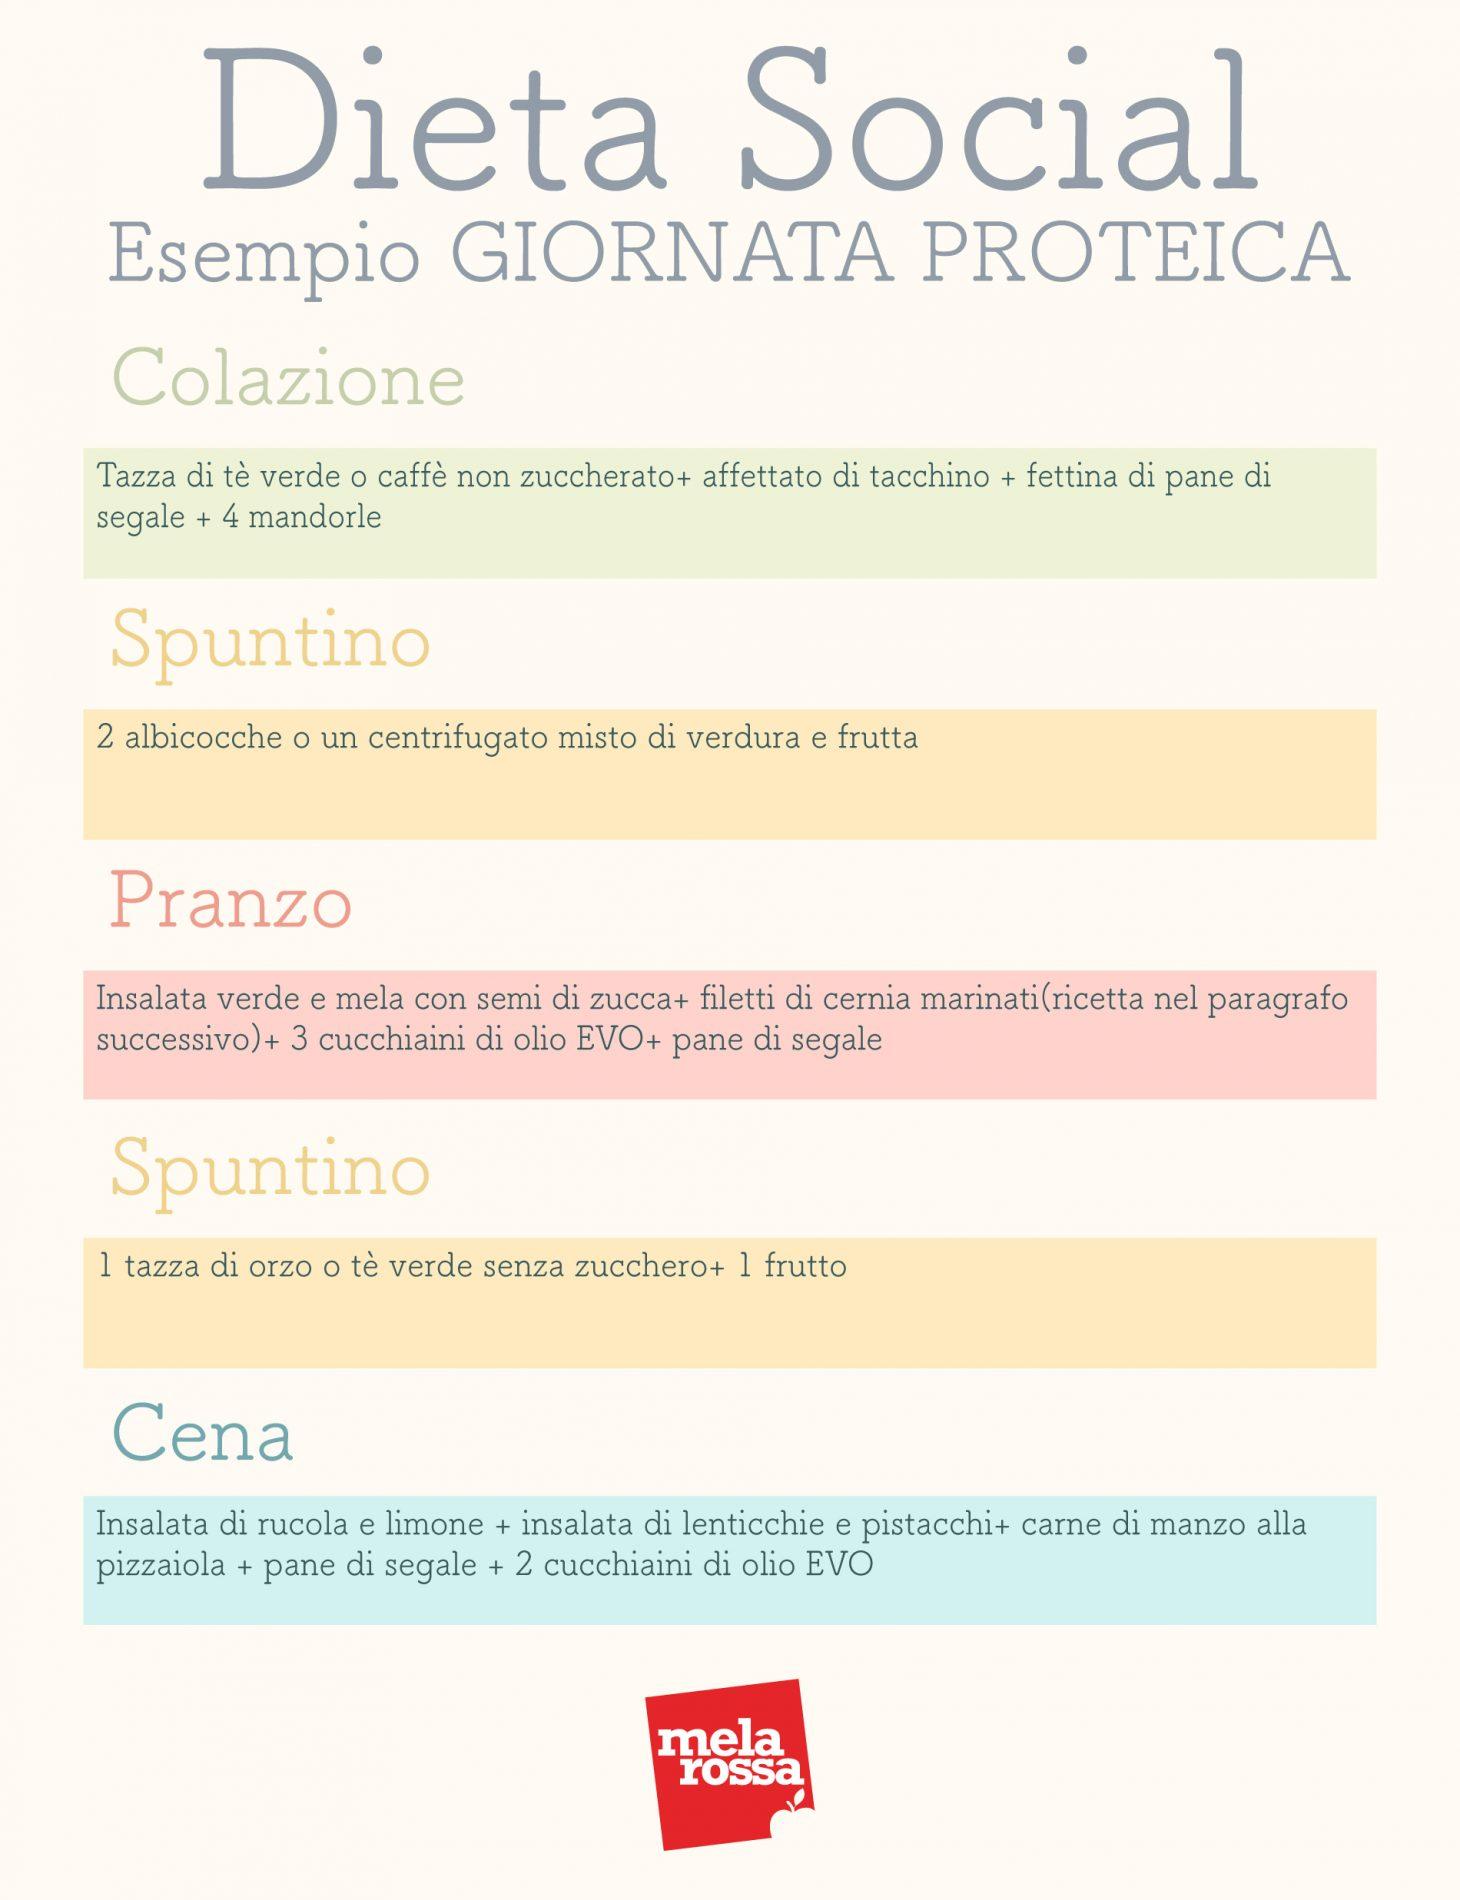 dieta social: esempio di menu proteico